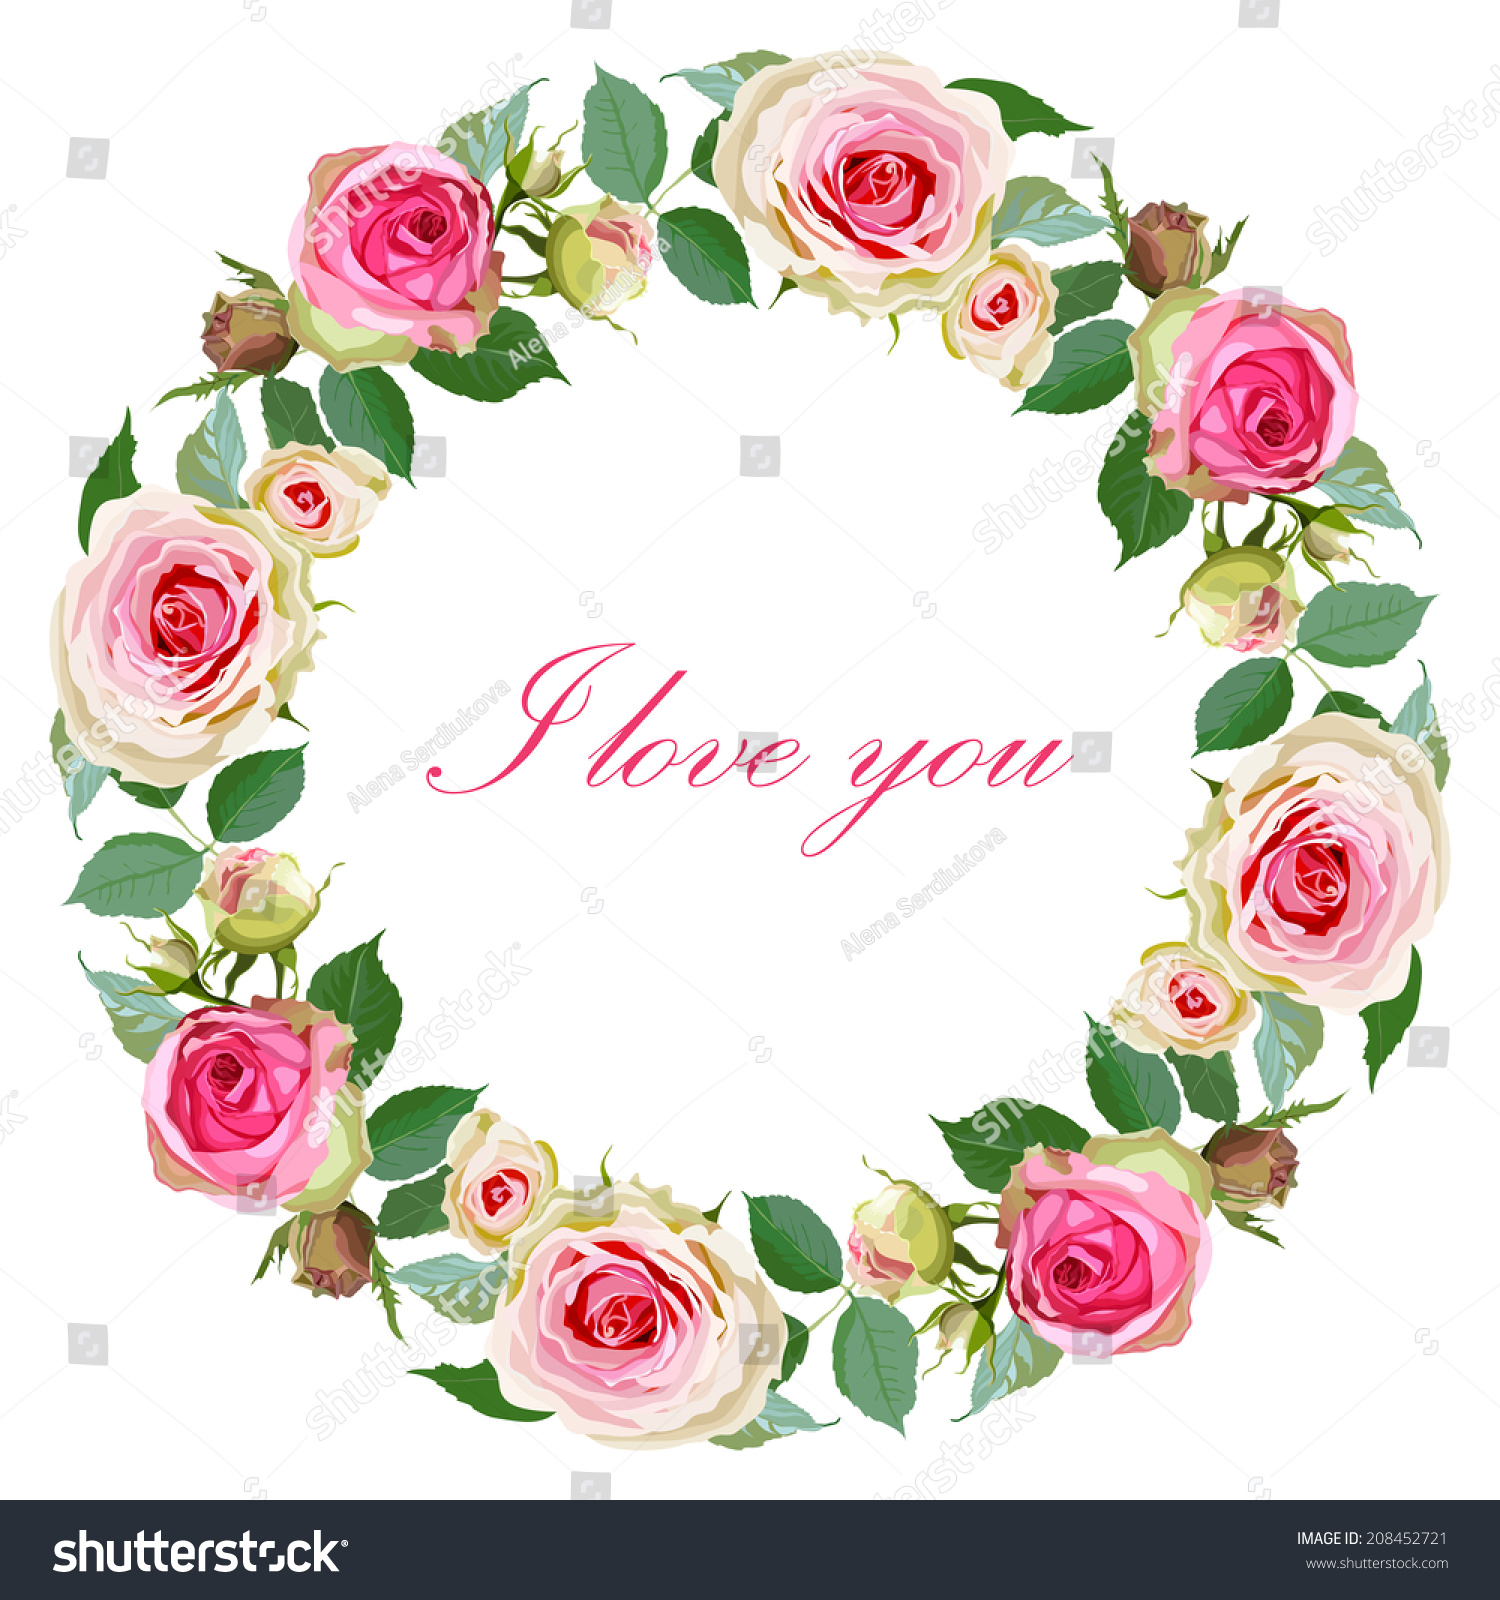 save date floral card wedding invitation stock vector 208452721 shutterstock. Black Bedroom Furniture Sets. Home Design Ideas